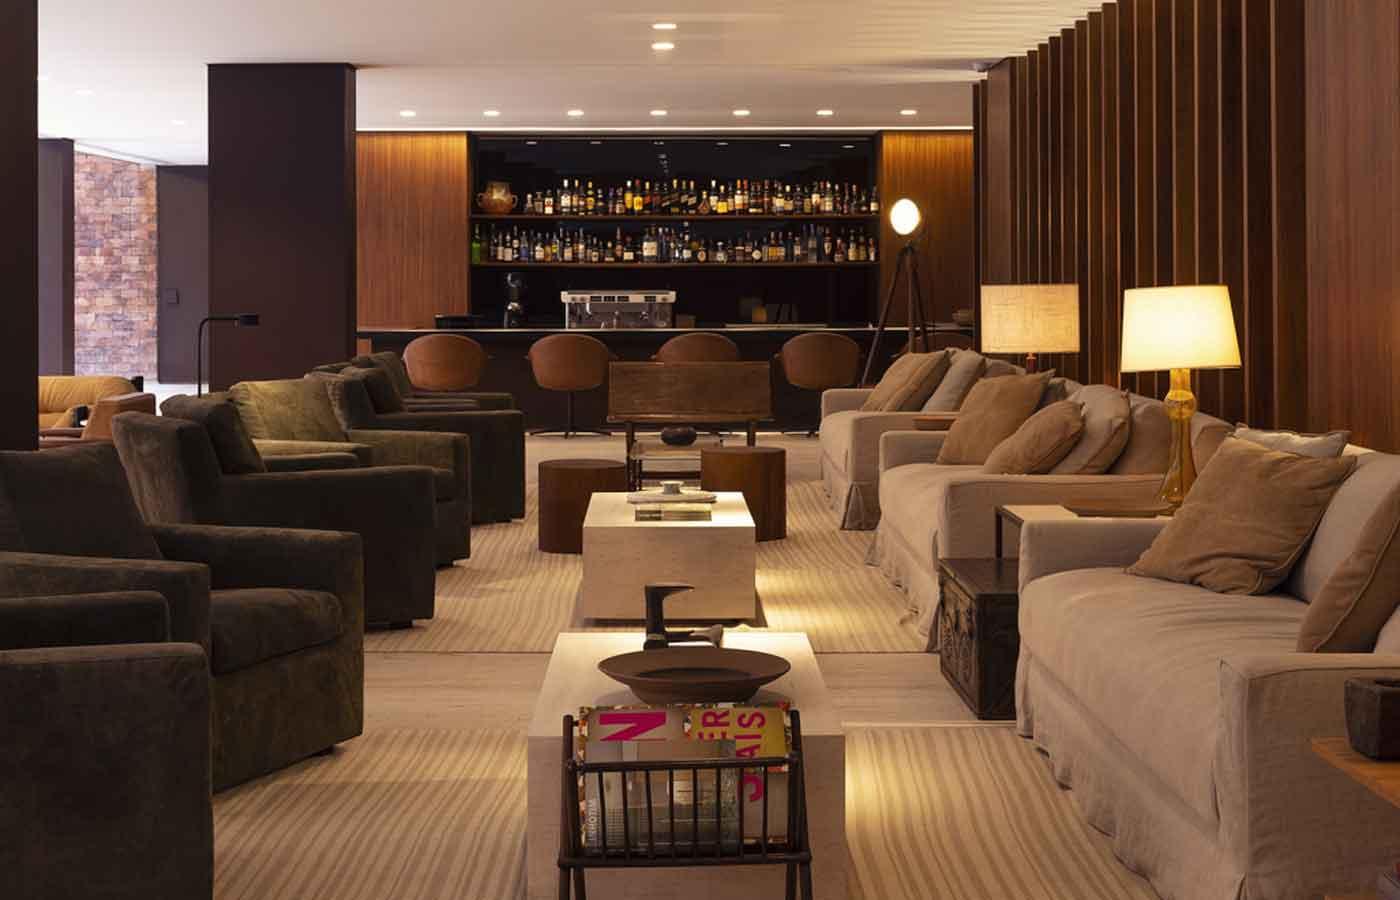 Hotel Fasano Belo Horizonte- lobby